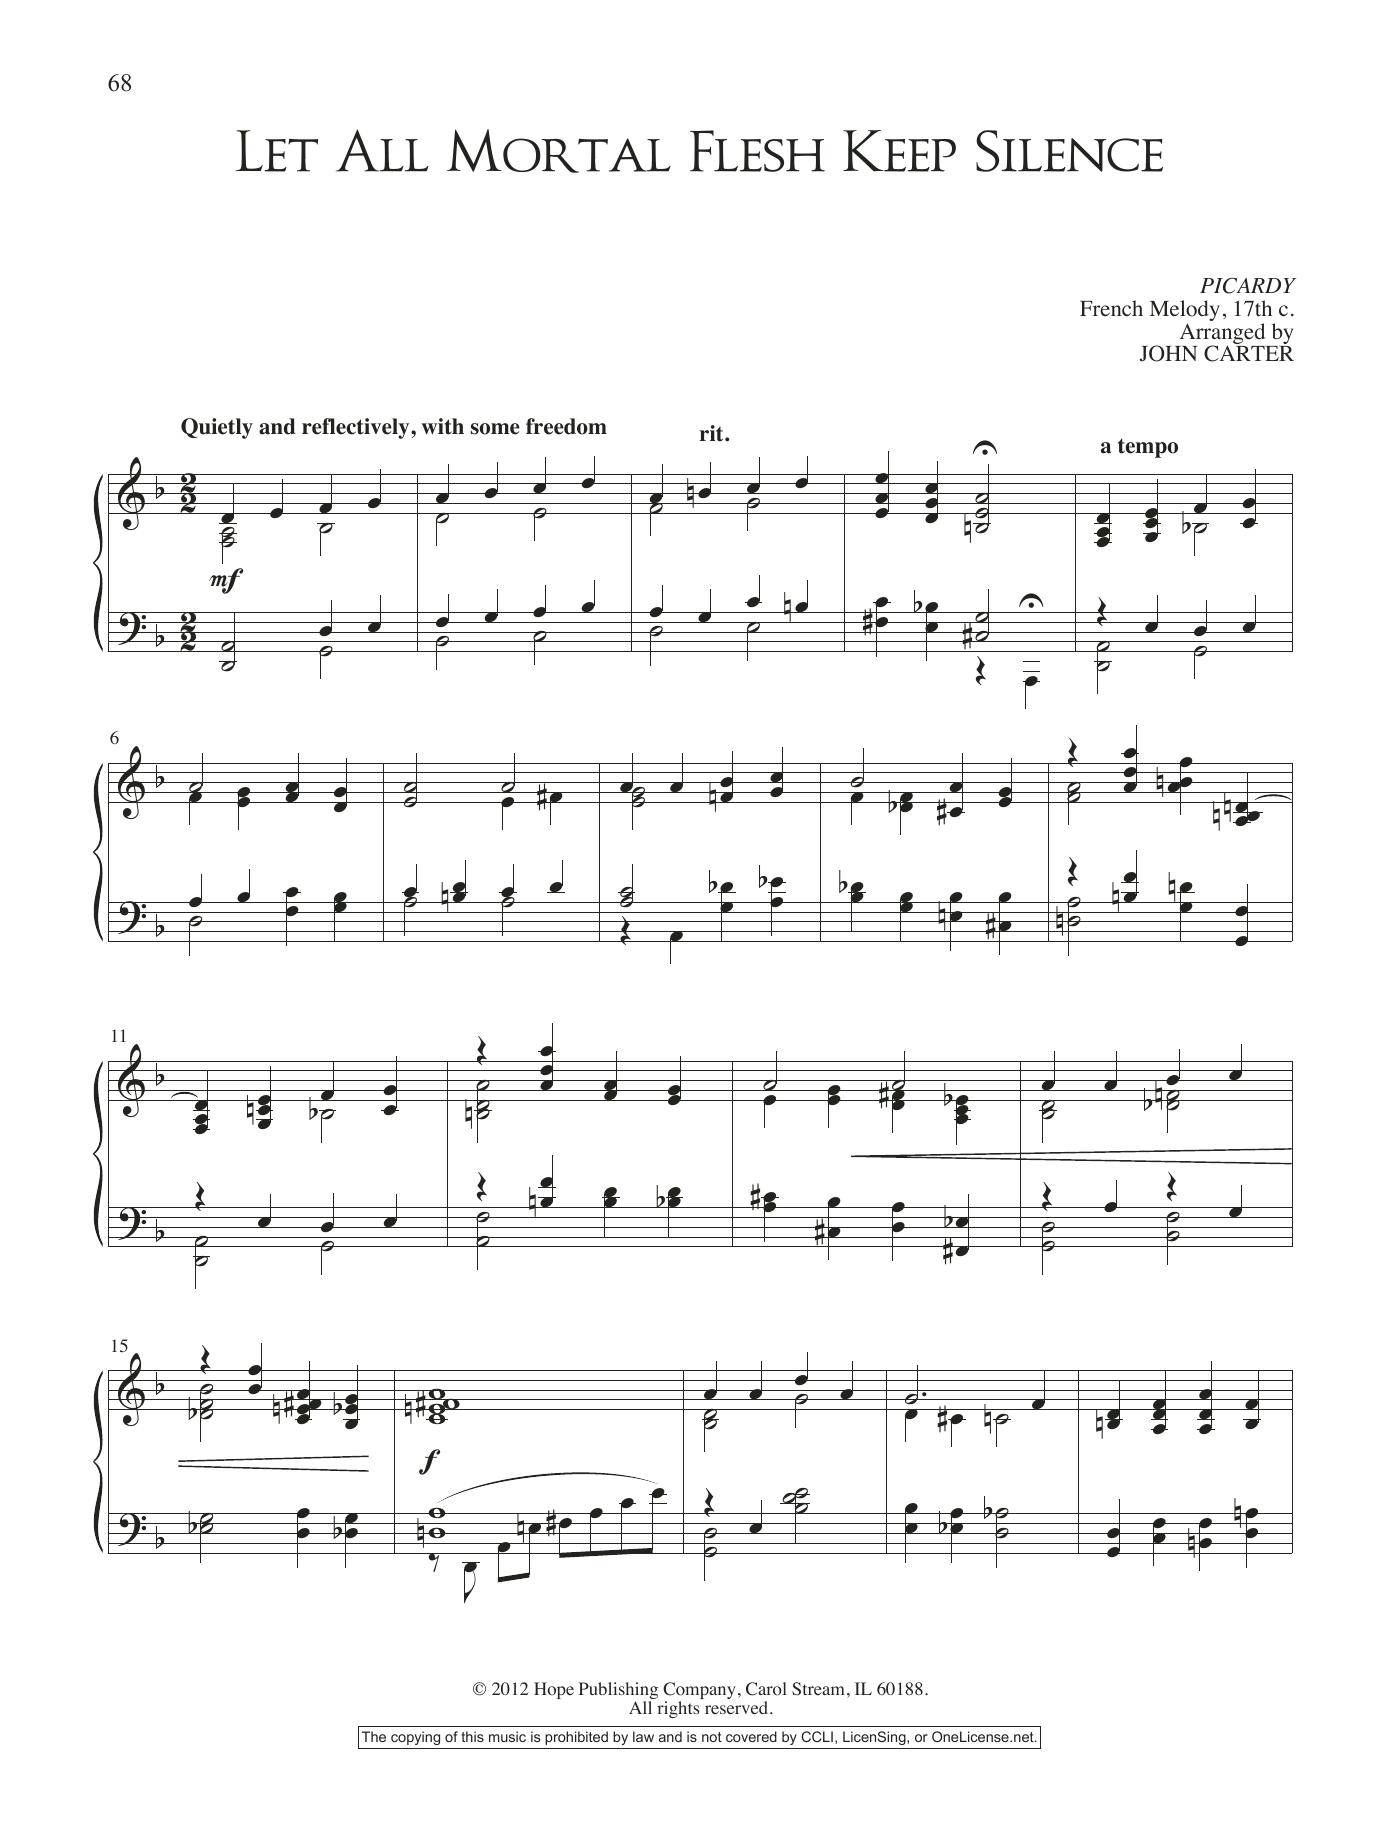 Let All Mortal Flesh Keep Silence by John Carter Piano Solo Digital Sheet  Music